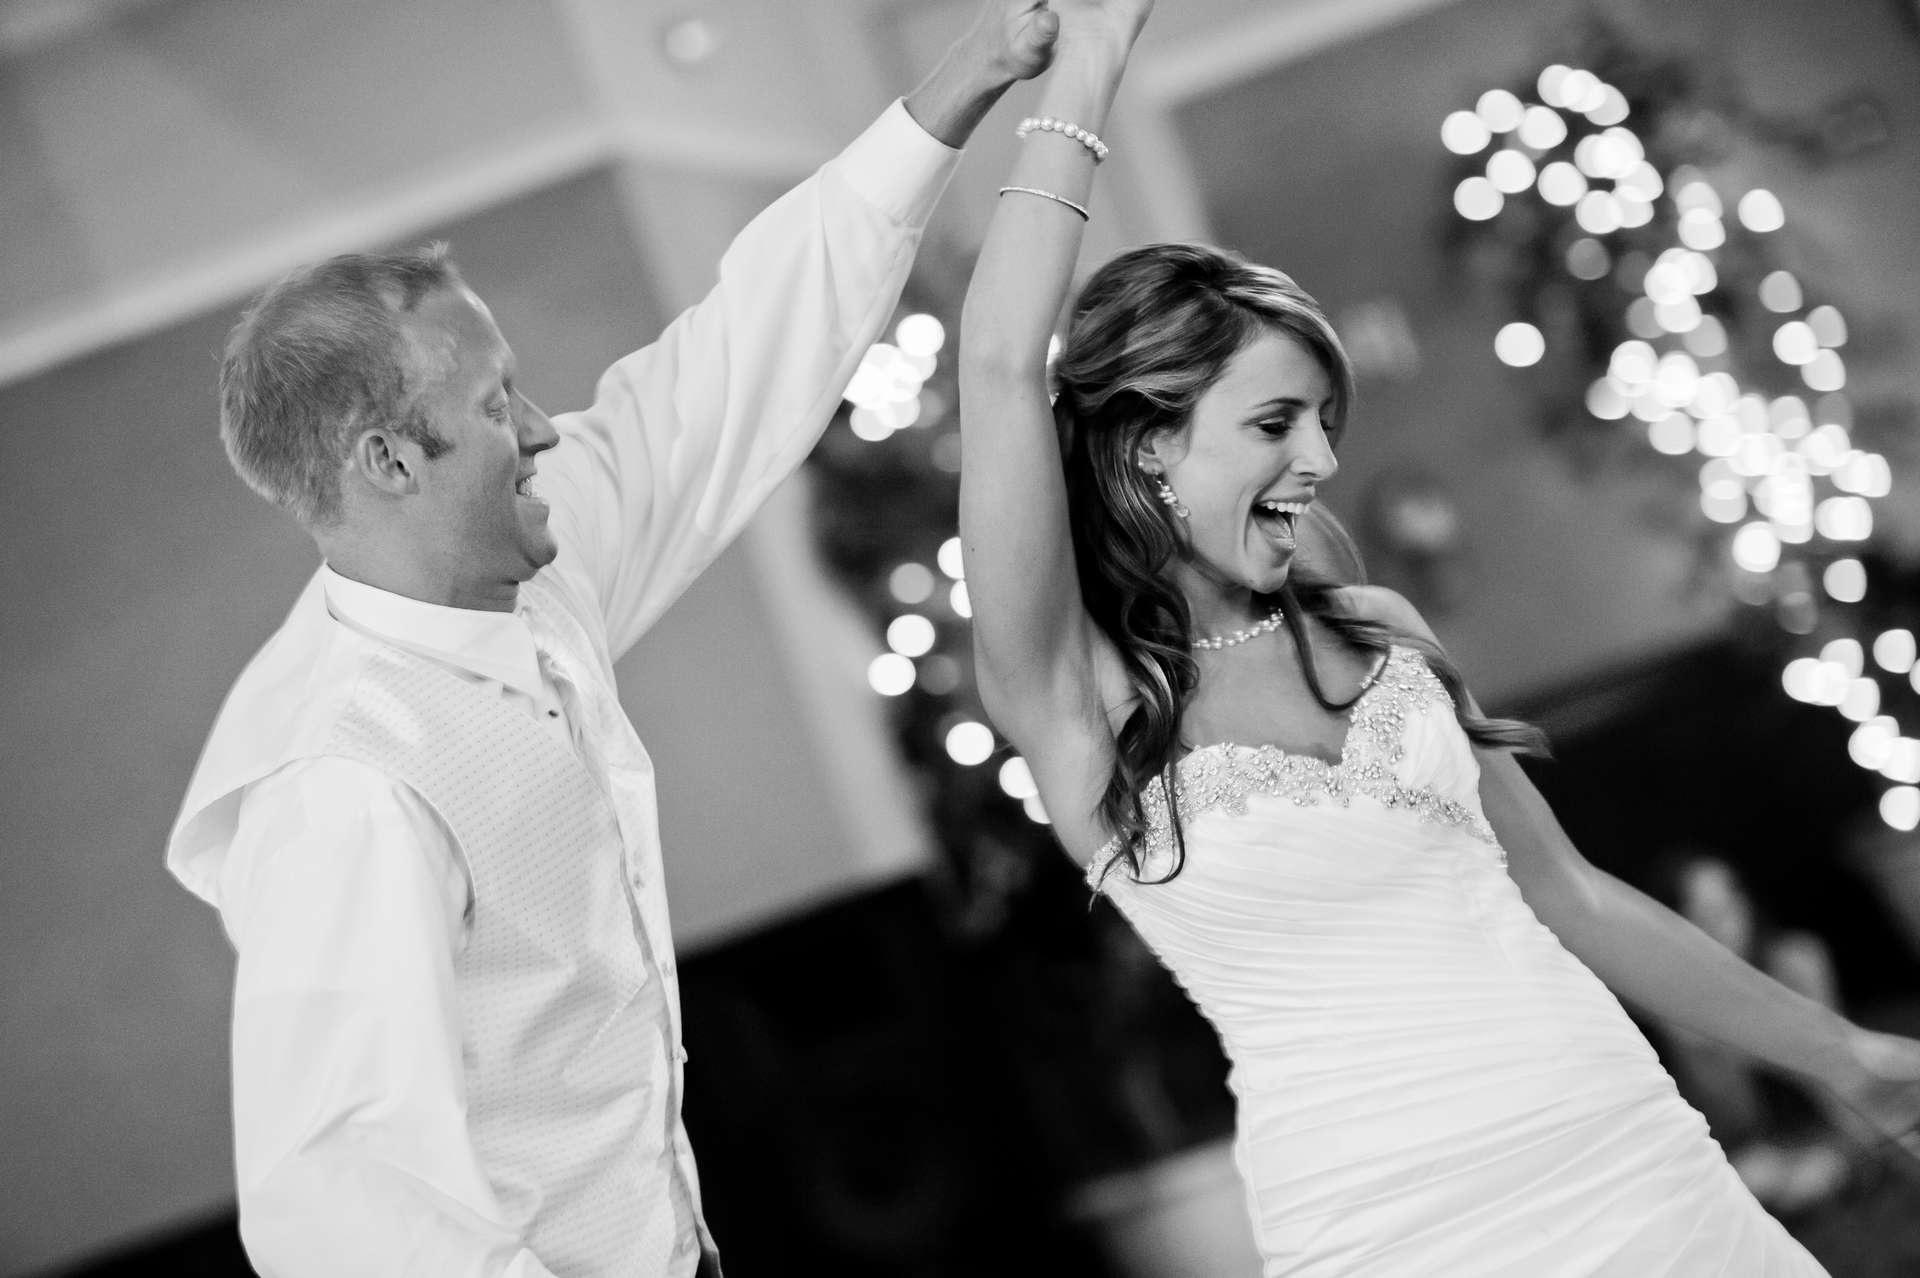 wedding-party-dance-bride-163219.jpeg